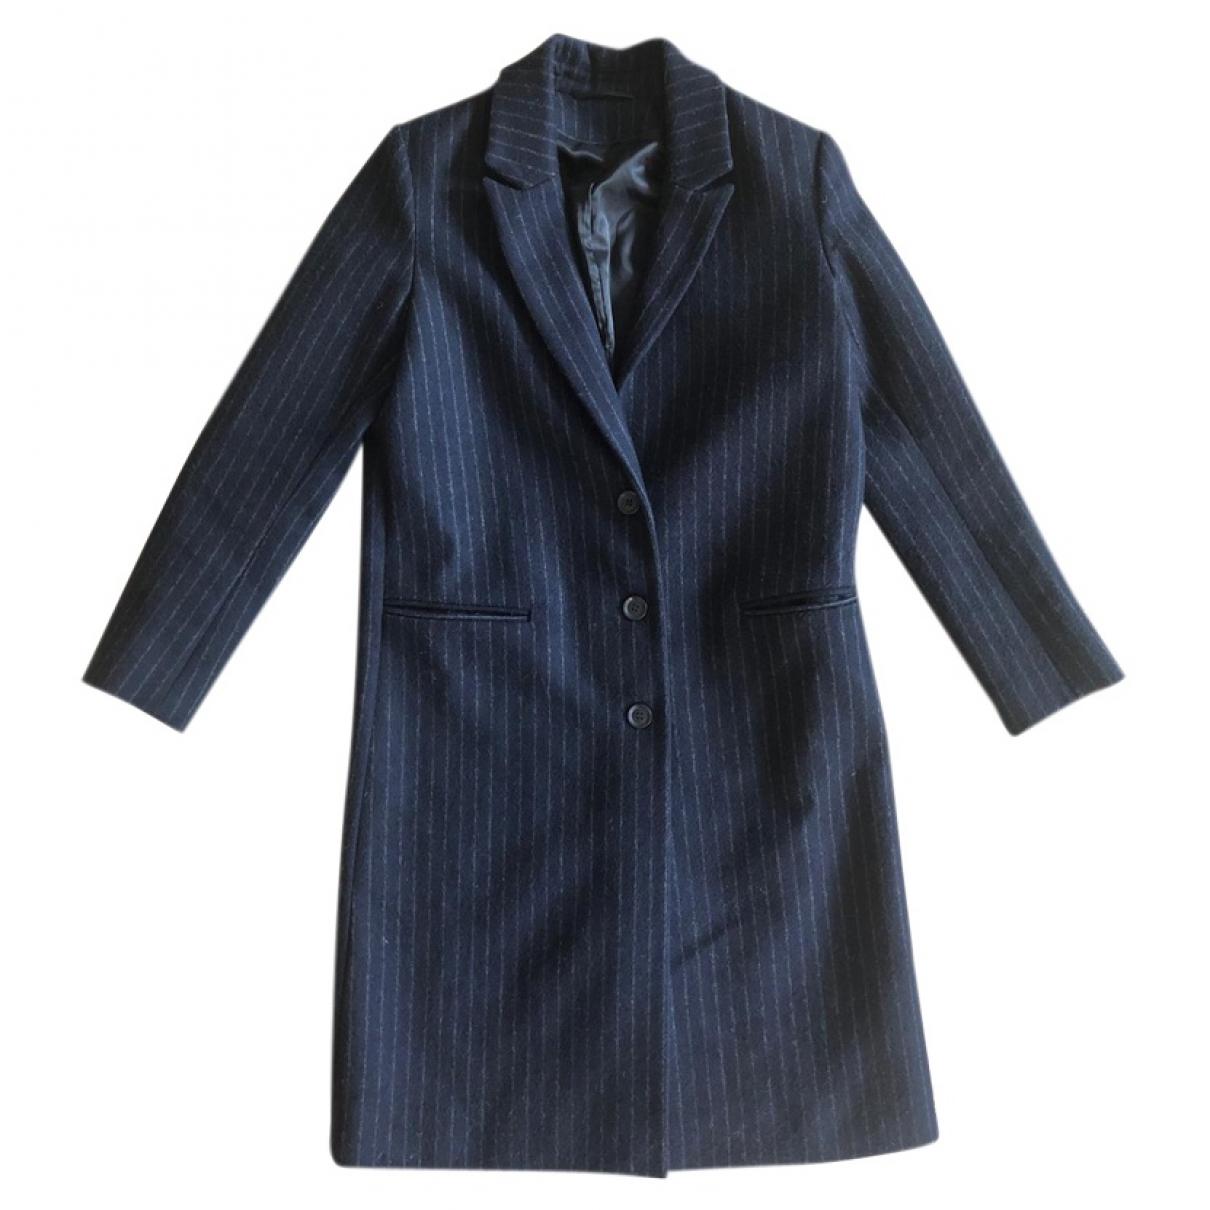 & Stories \N Navy Wool coat for Women 34 FR